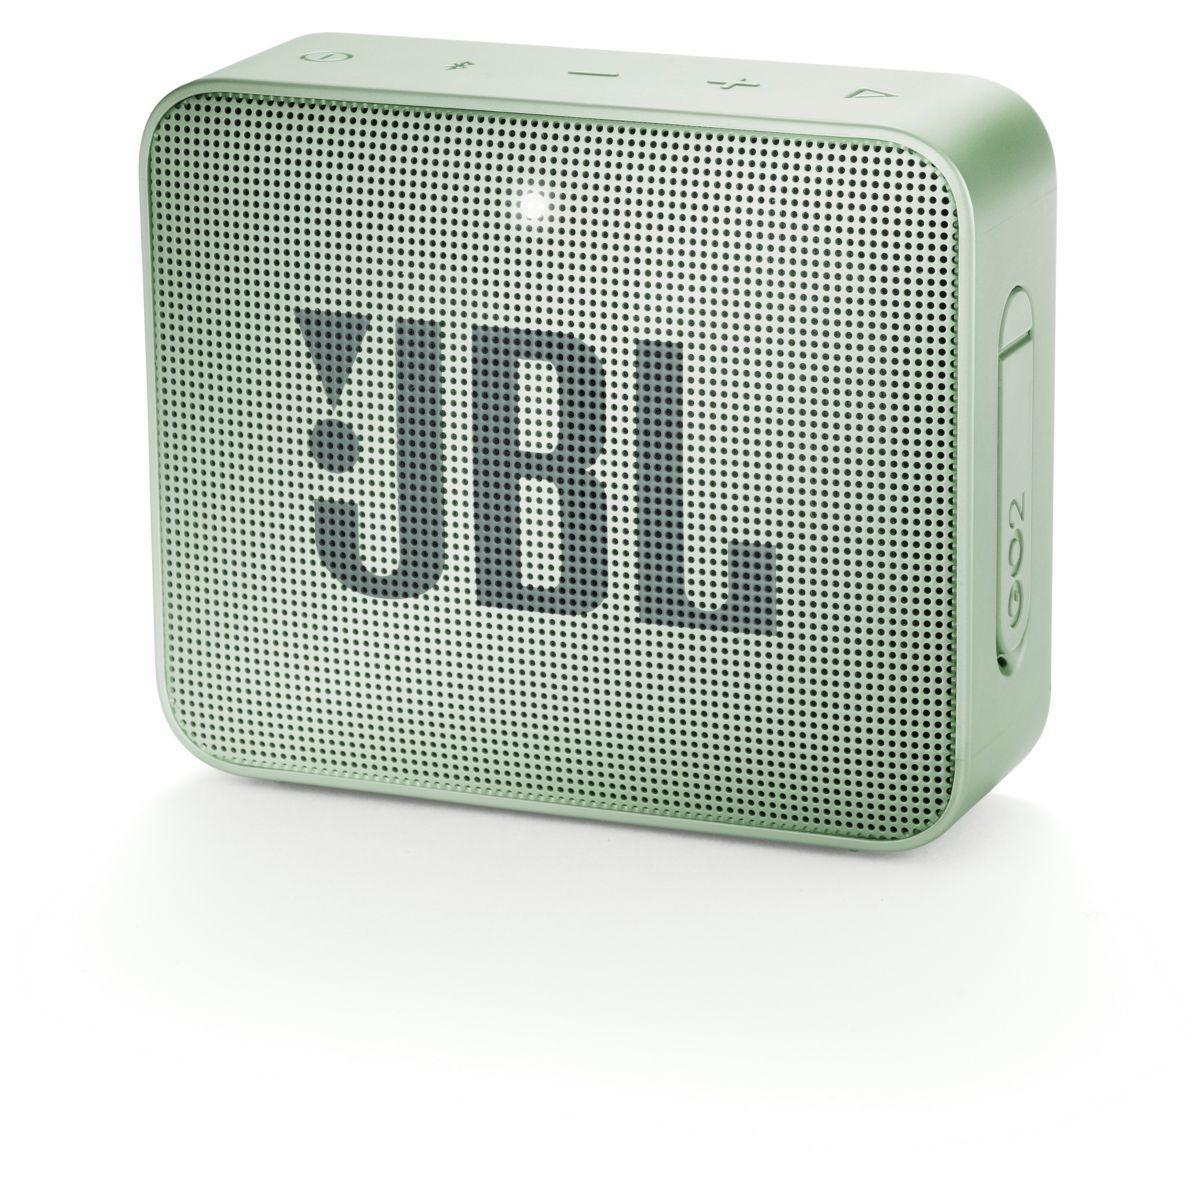 Enceinte bluetooth jbl go 2 vert menthe - livraison offerte : code livdom (photo)